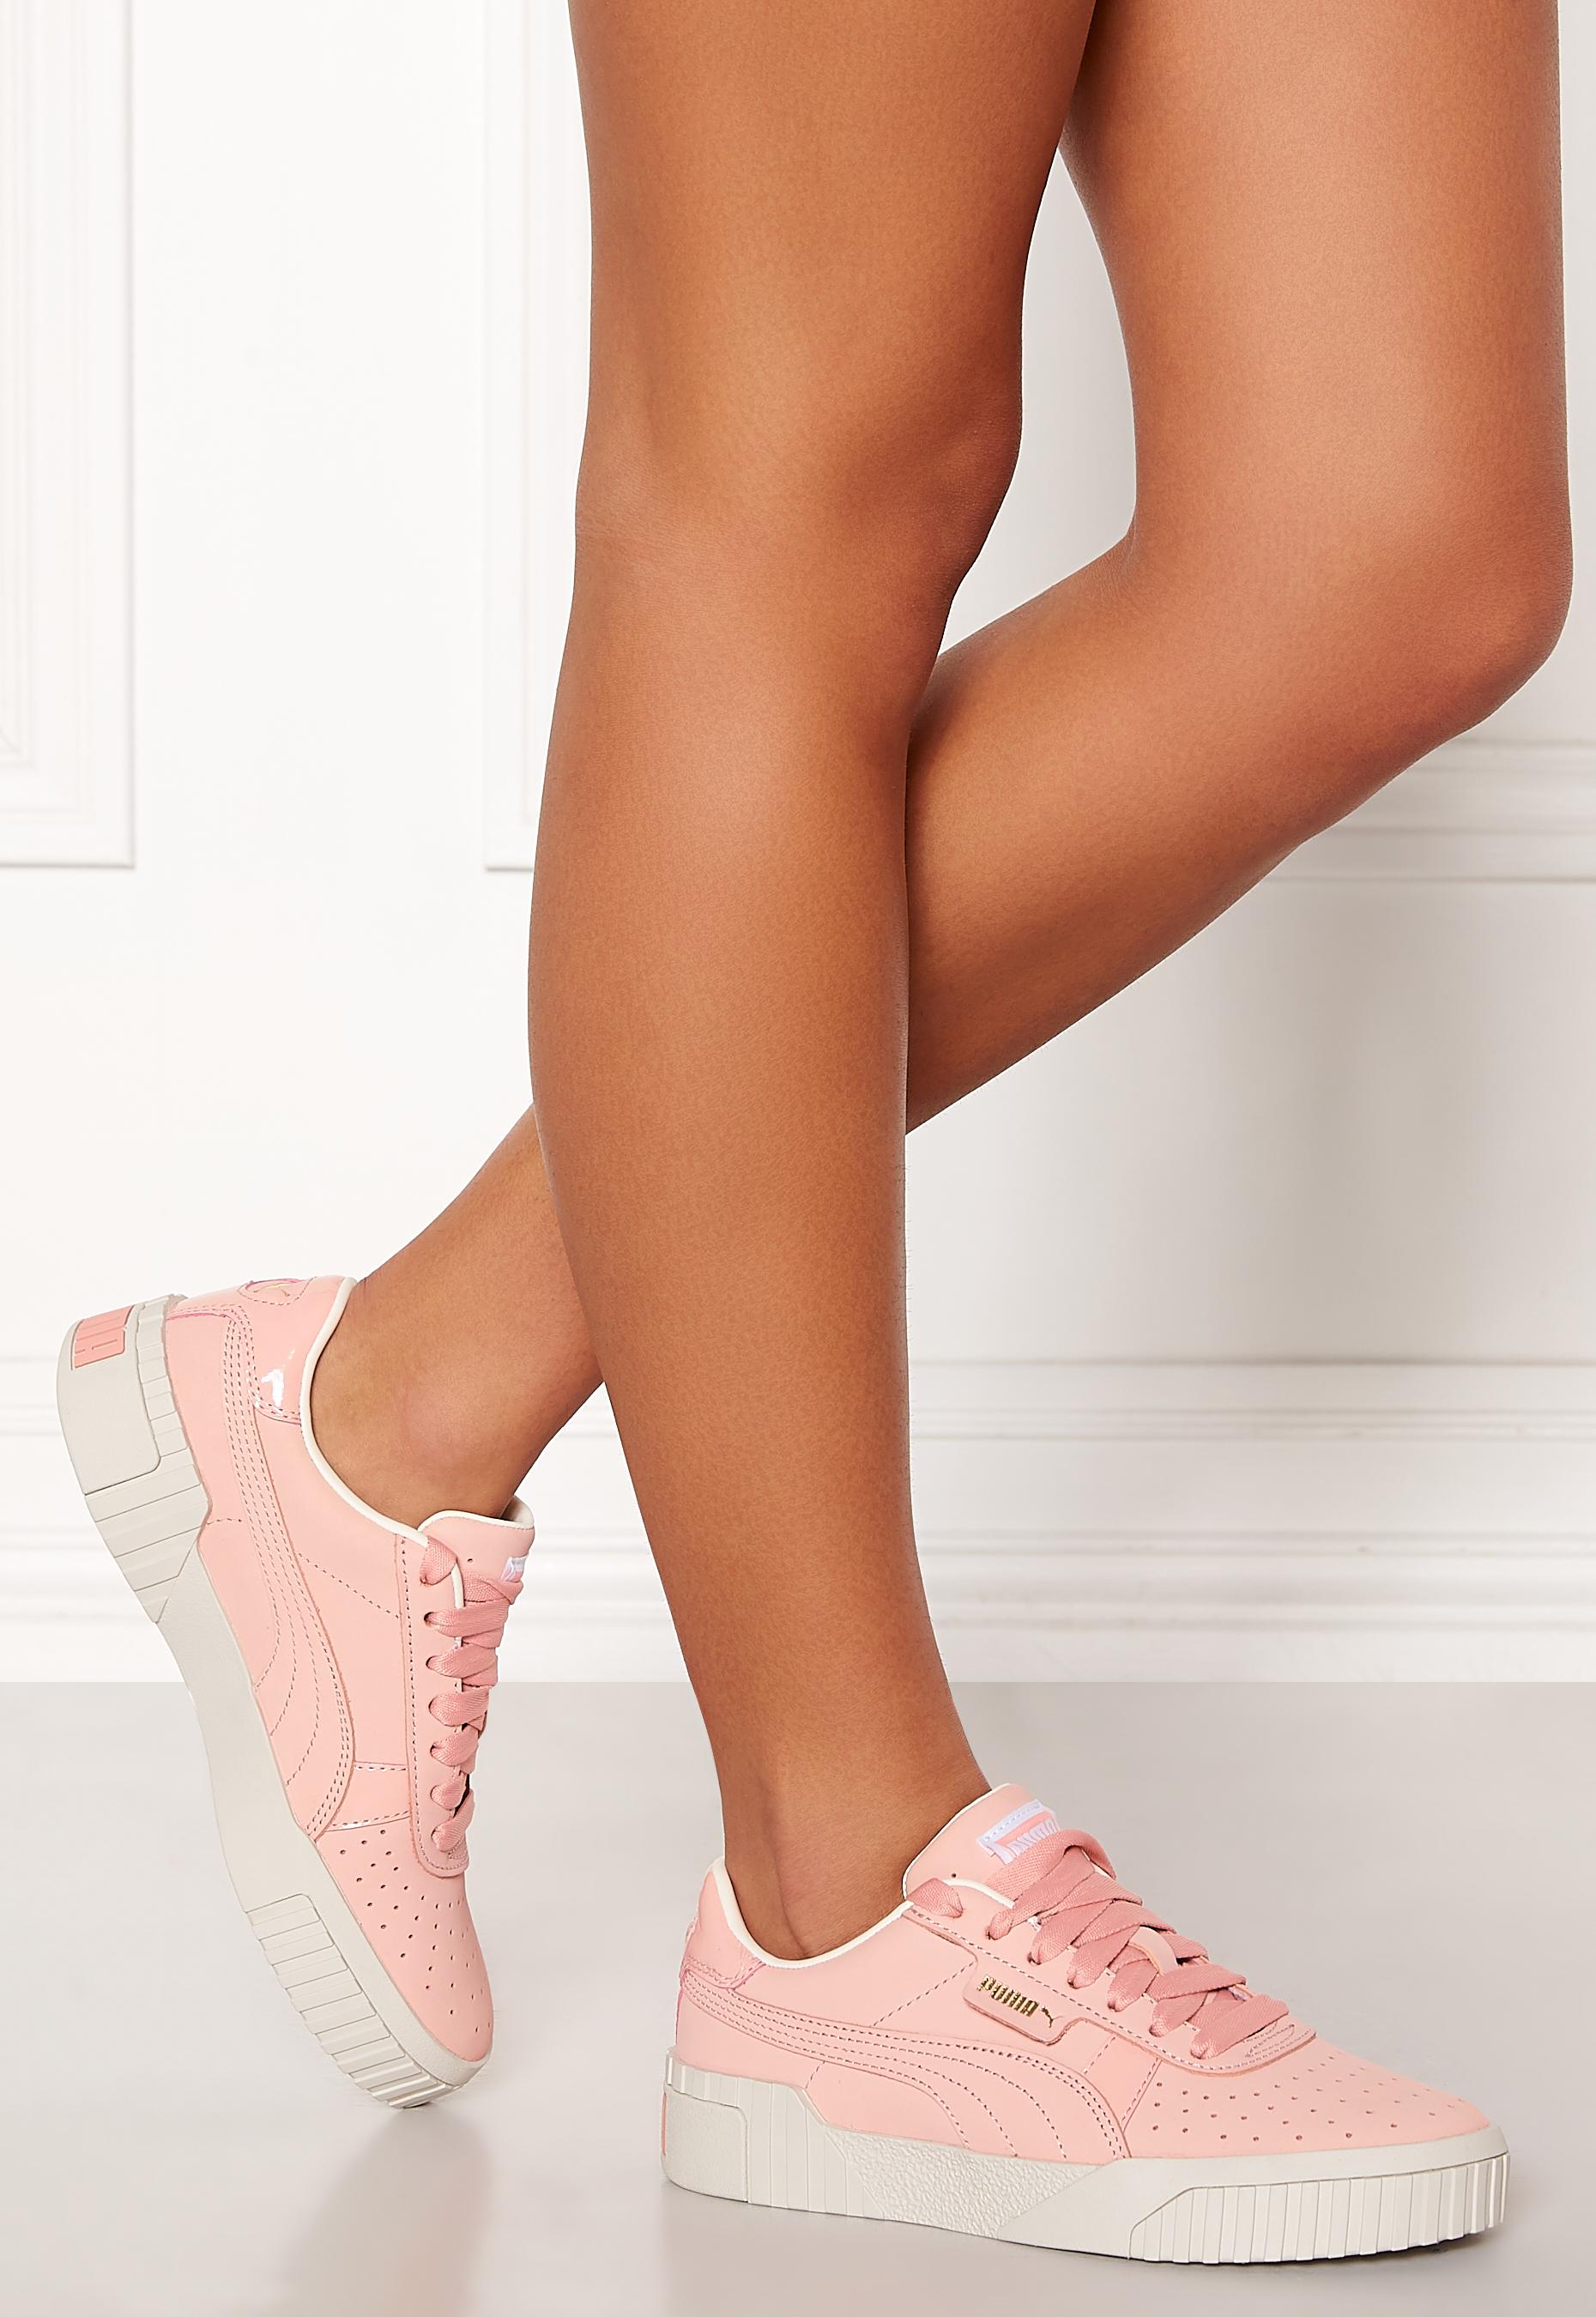 PUMA Cali Nubuck Sneakers 001 Peach